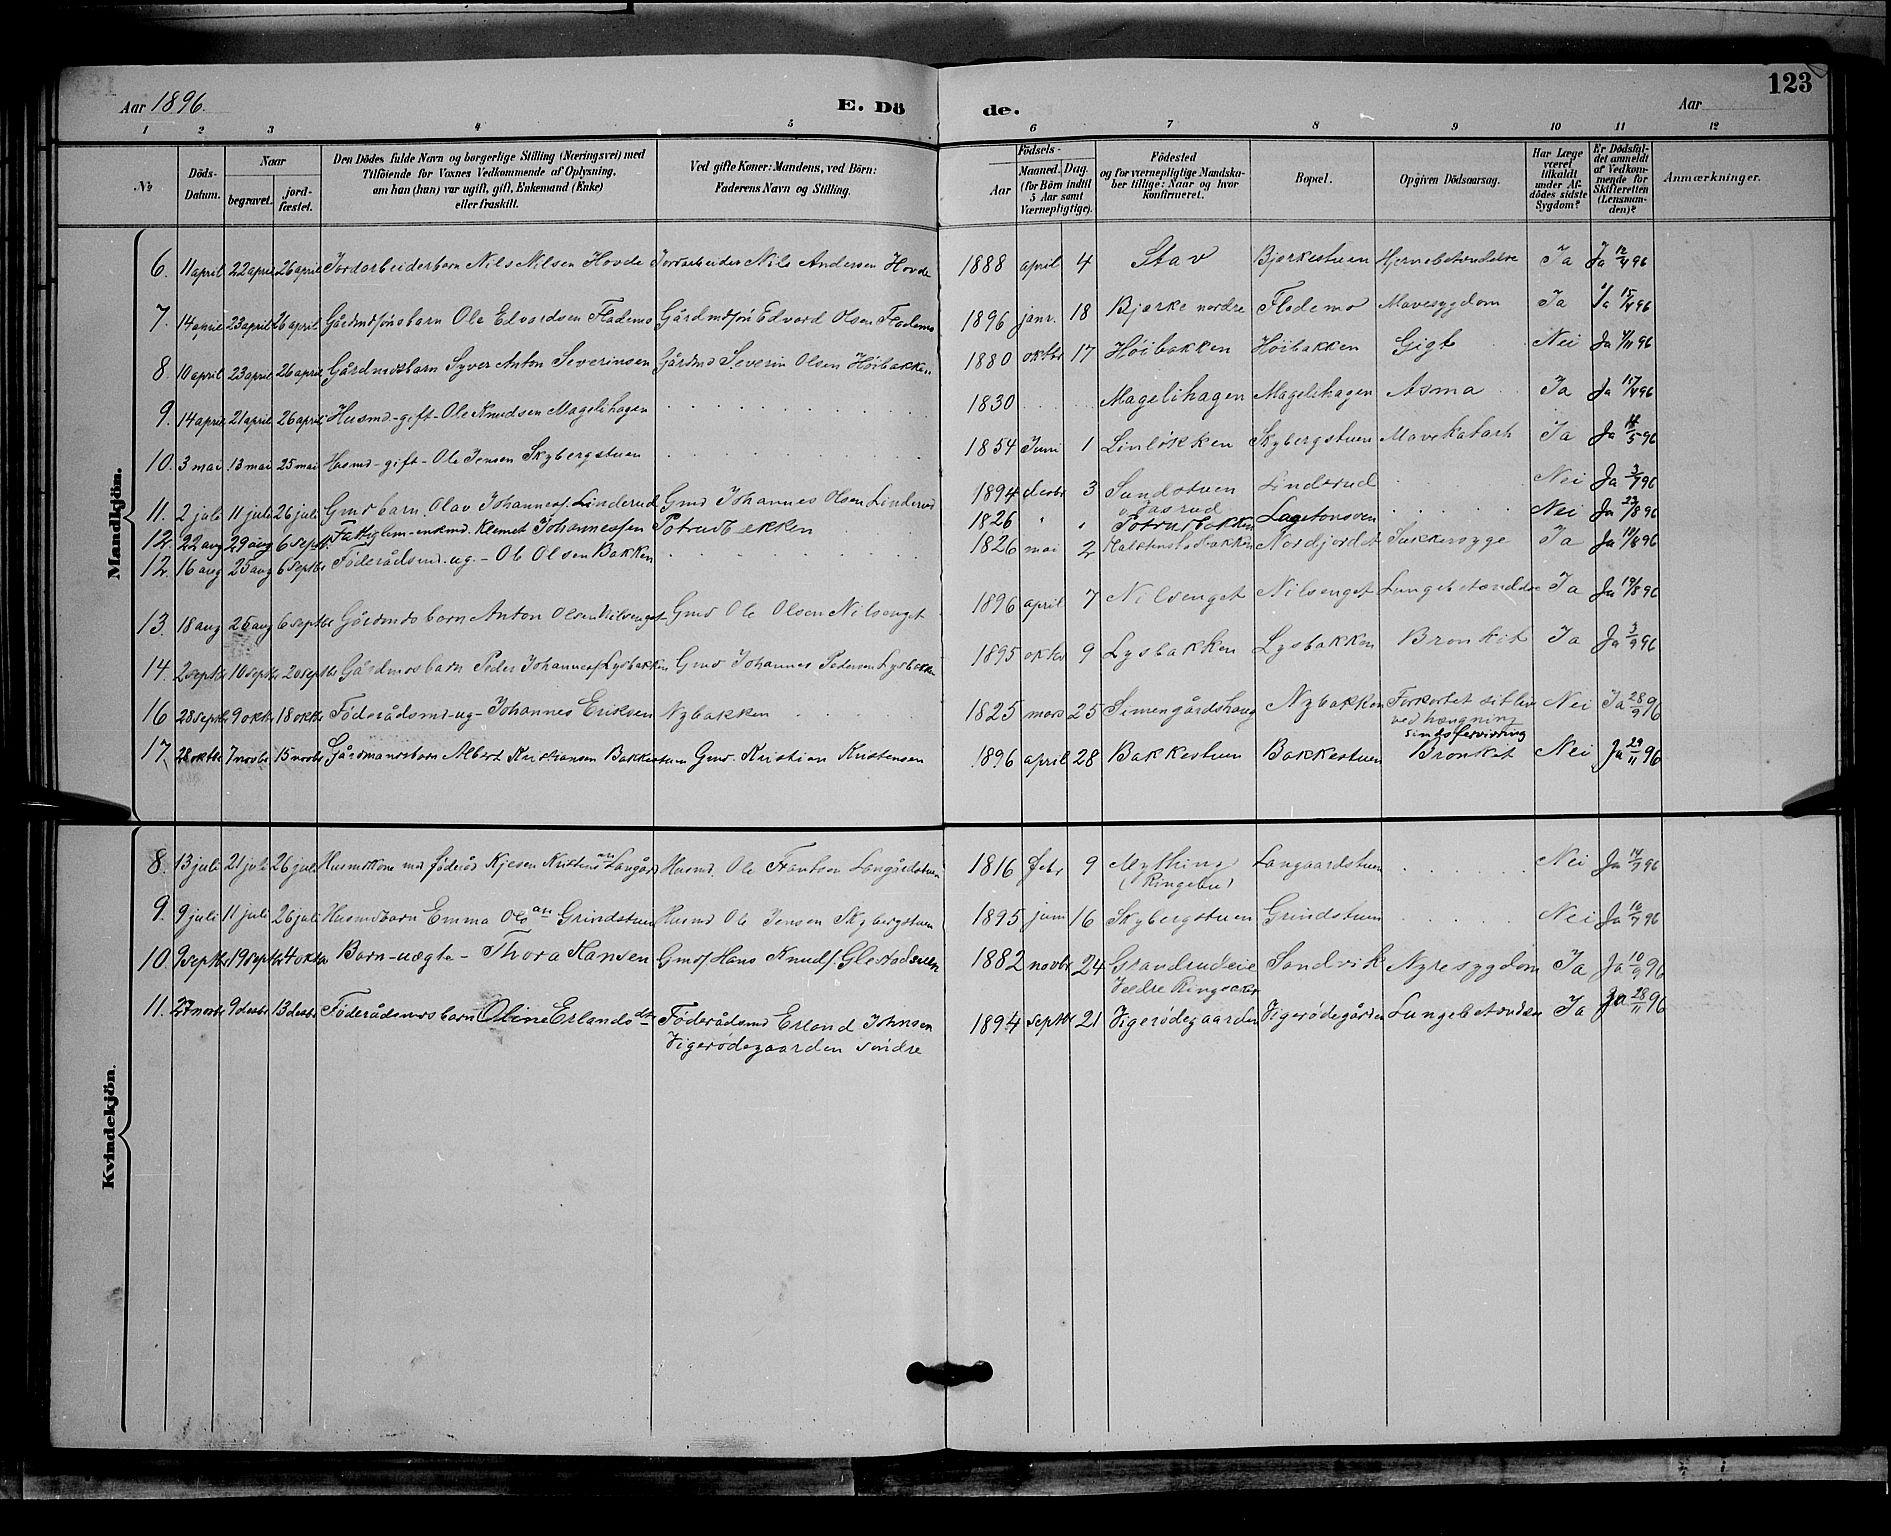 SAH, Øyer prestekontor, Klokkerbok nr. 4, 1894-1905, s. 123